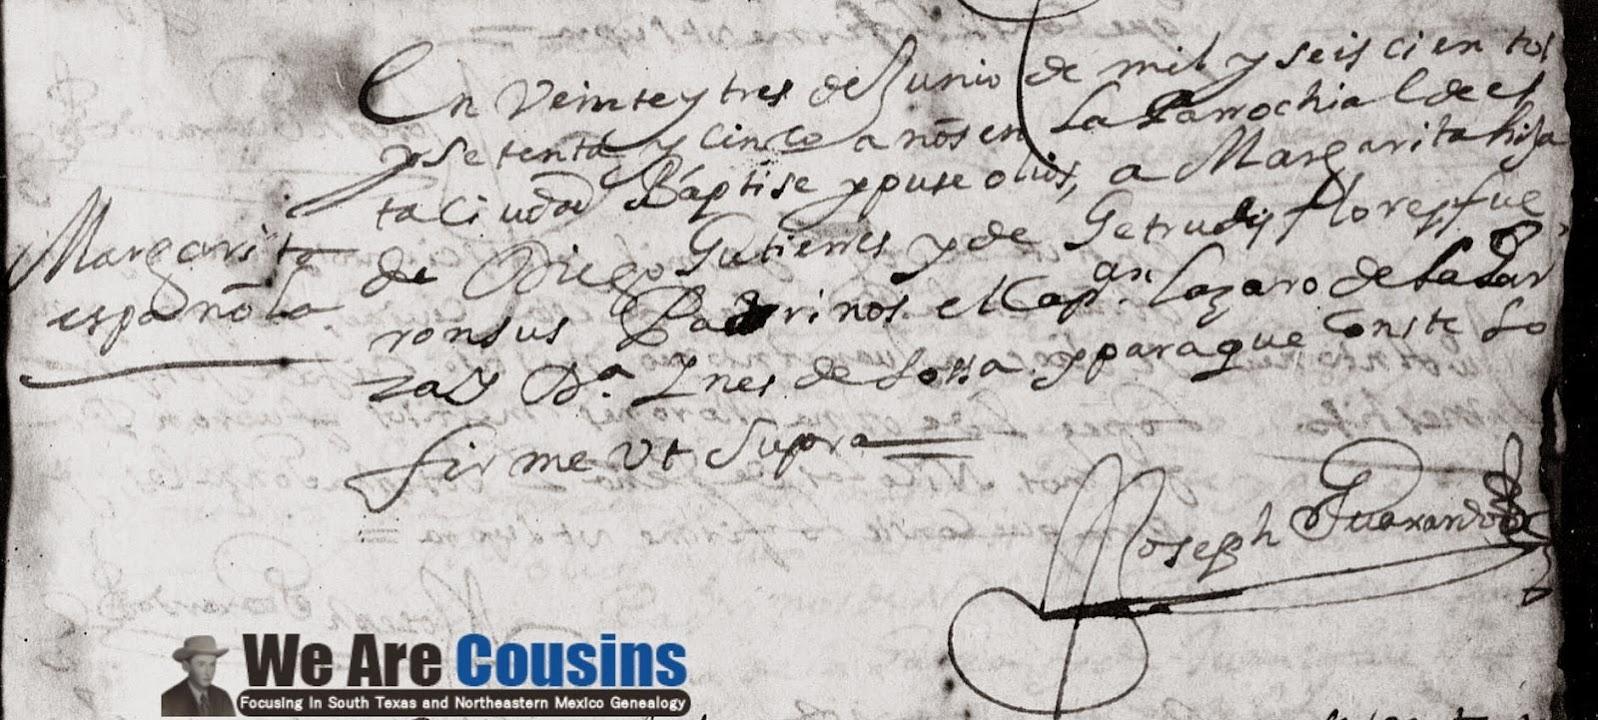 Margarita Gutierrez FamilySearch Monterrey Baptism 1675 Pg 35